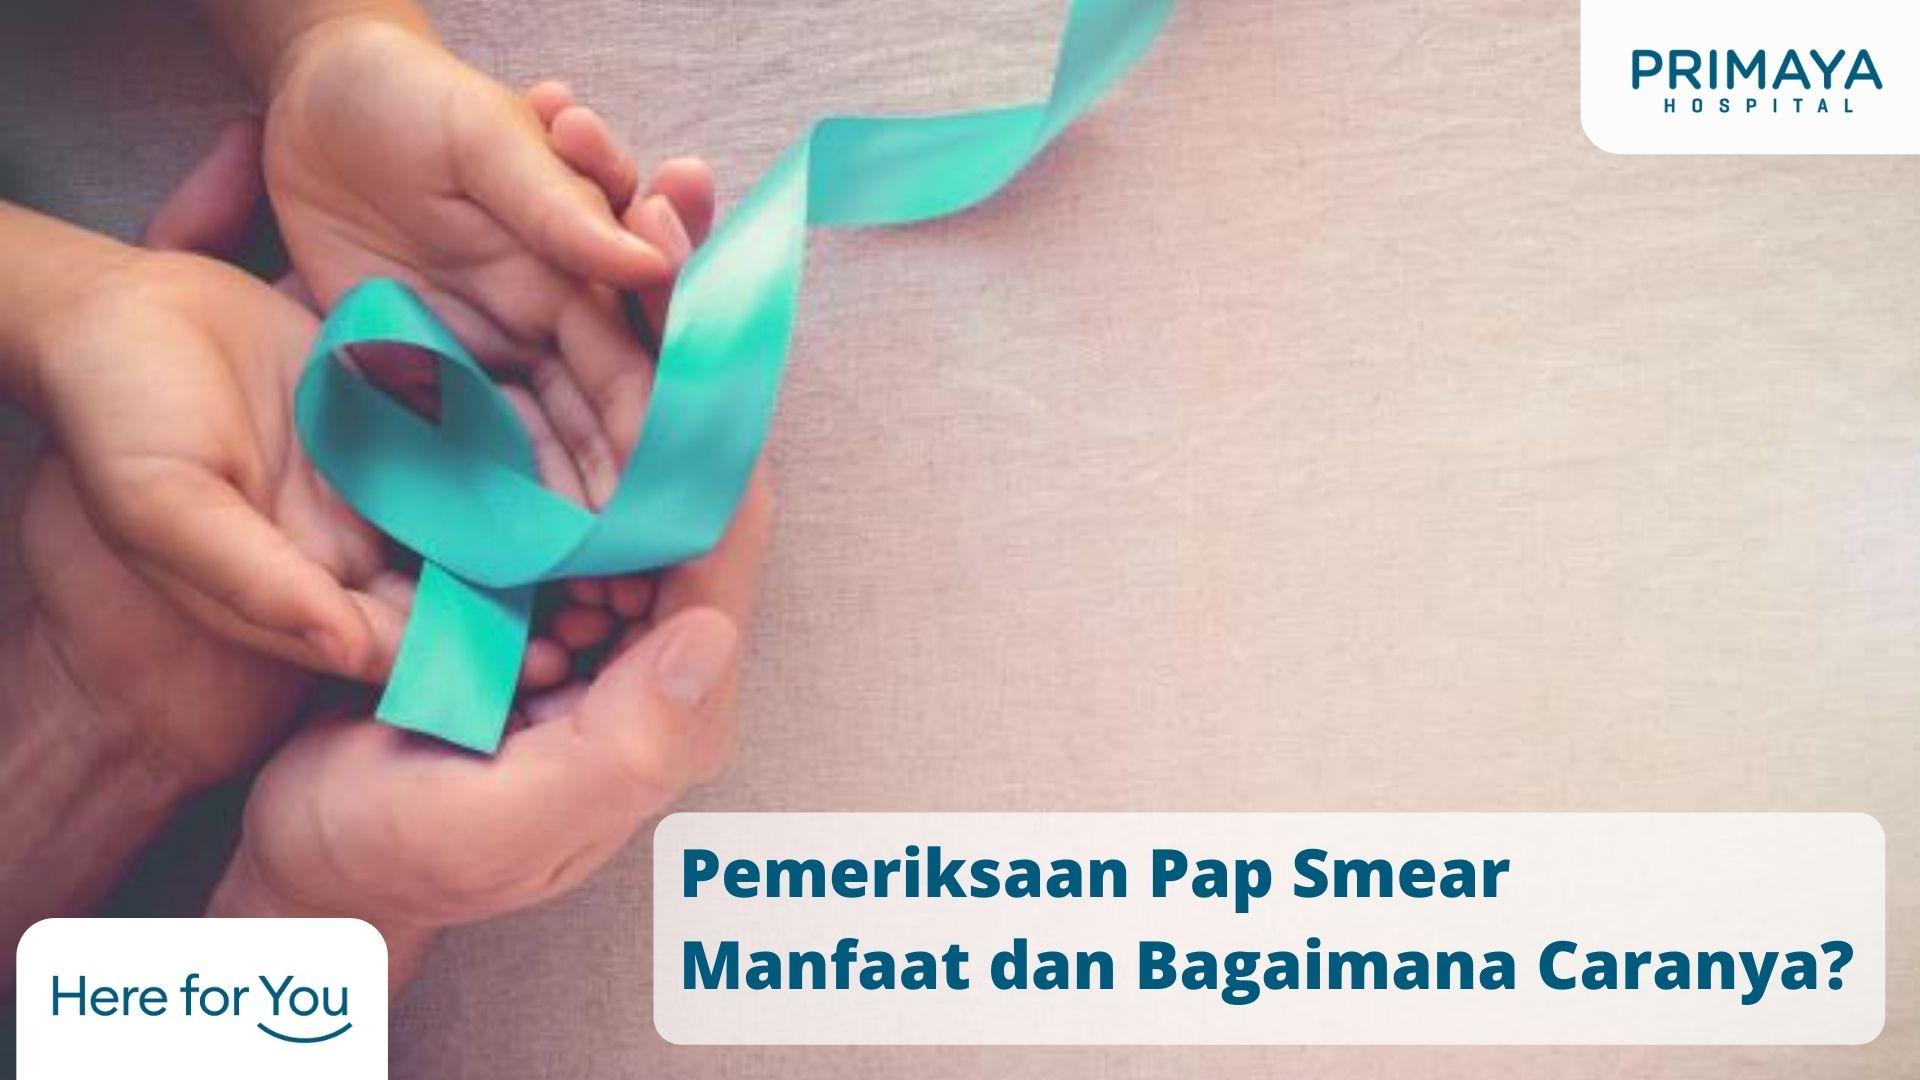 Pemeriksaan Pap Smear, Manfaat dan Bagaimana Caranya?